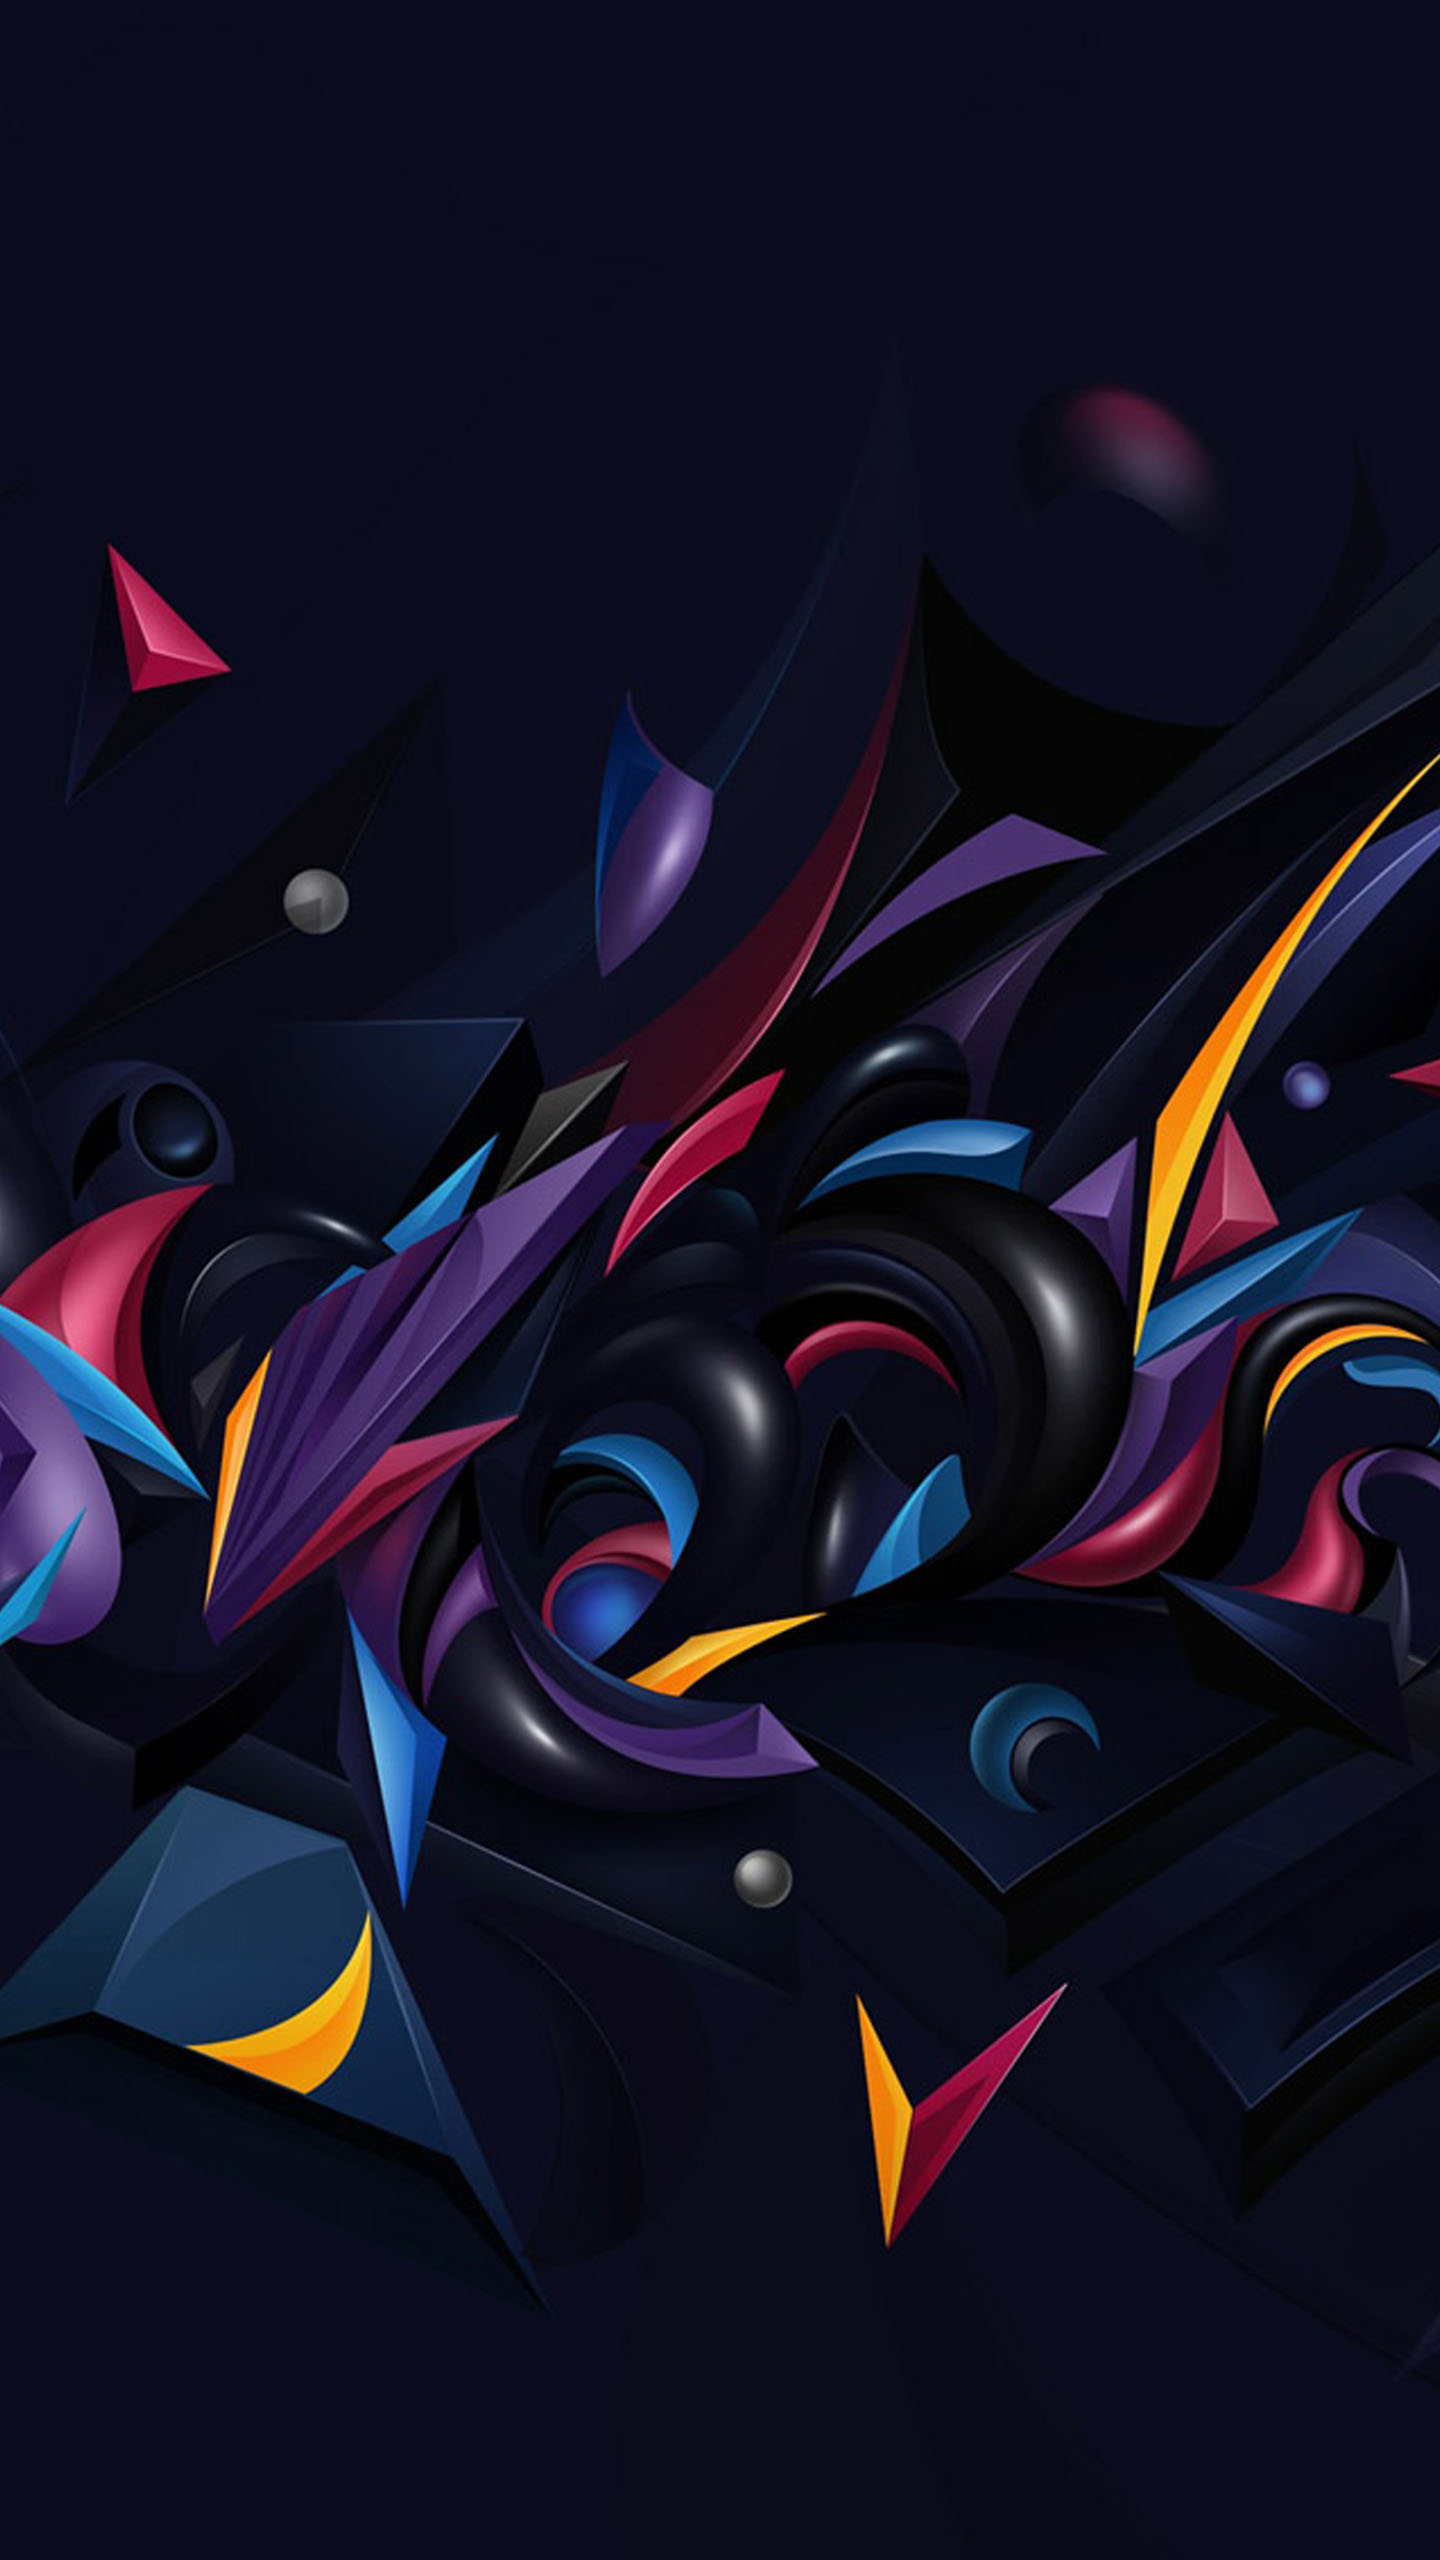 3D Samsung Galaxy S5 Wallpapers   Part 21 1440x2560